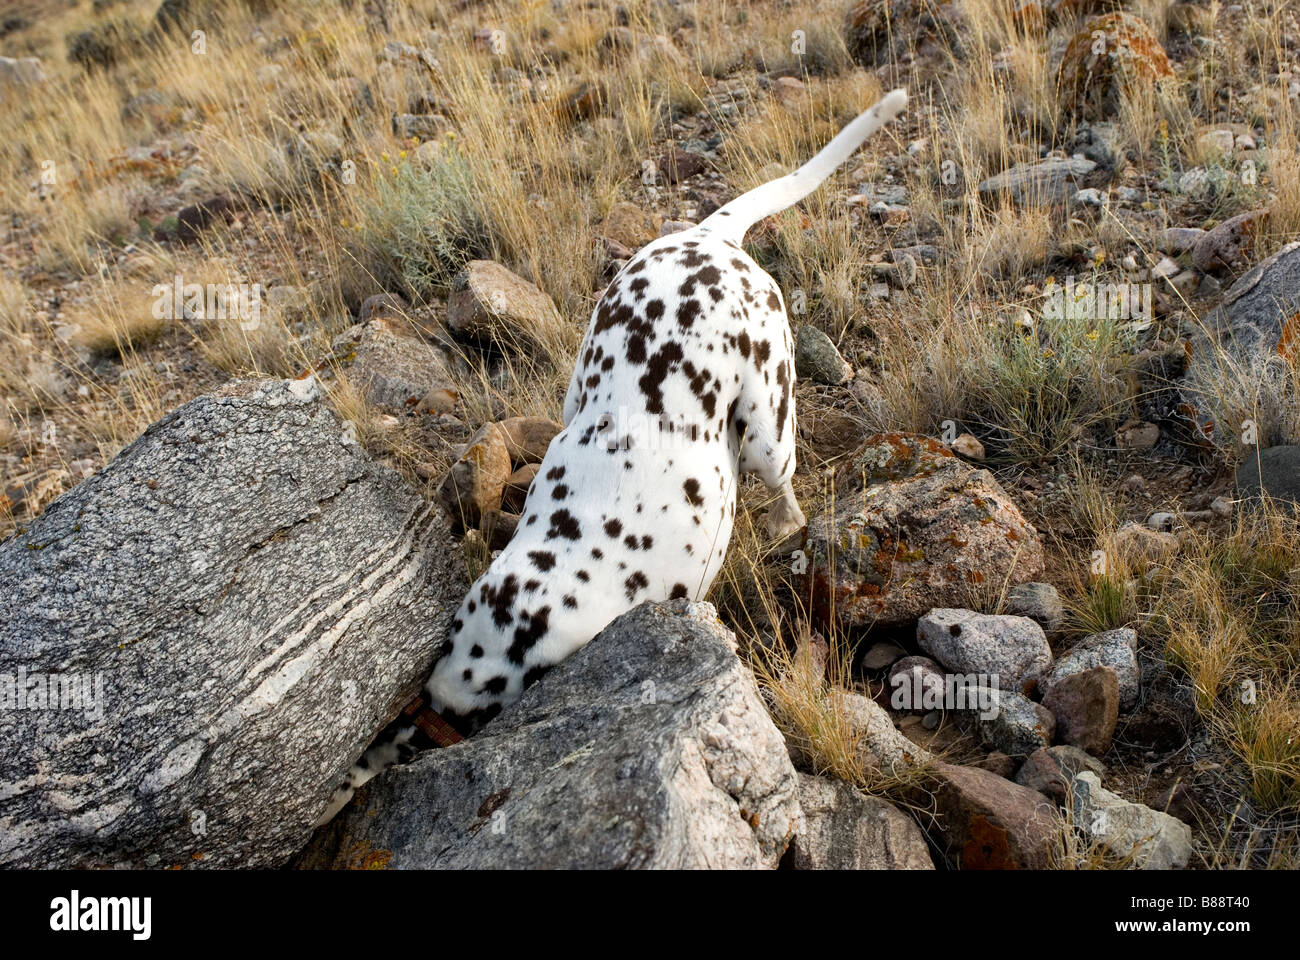 Dalmatian hunting. - Stock Image